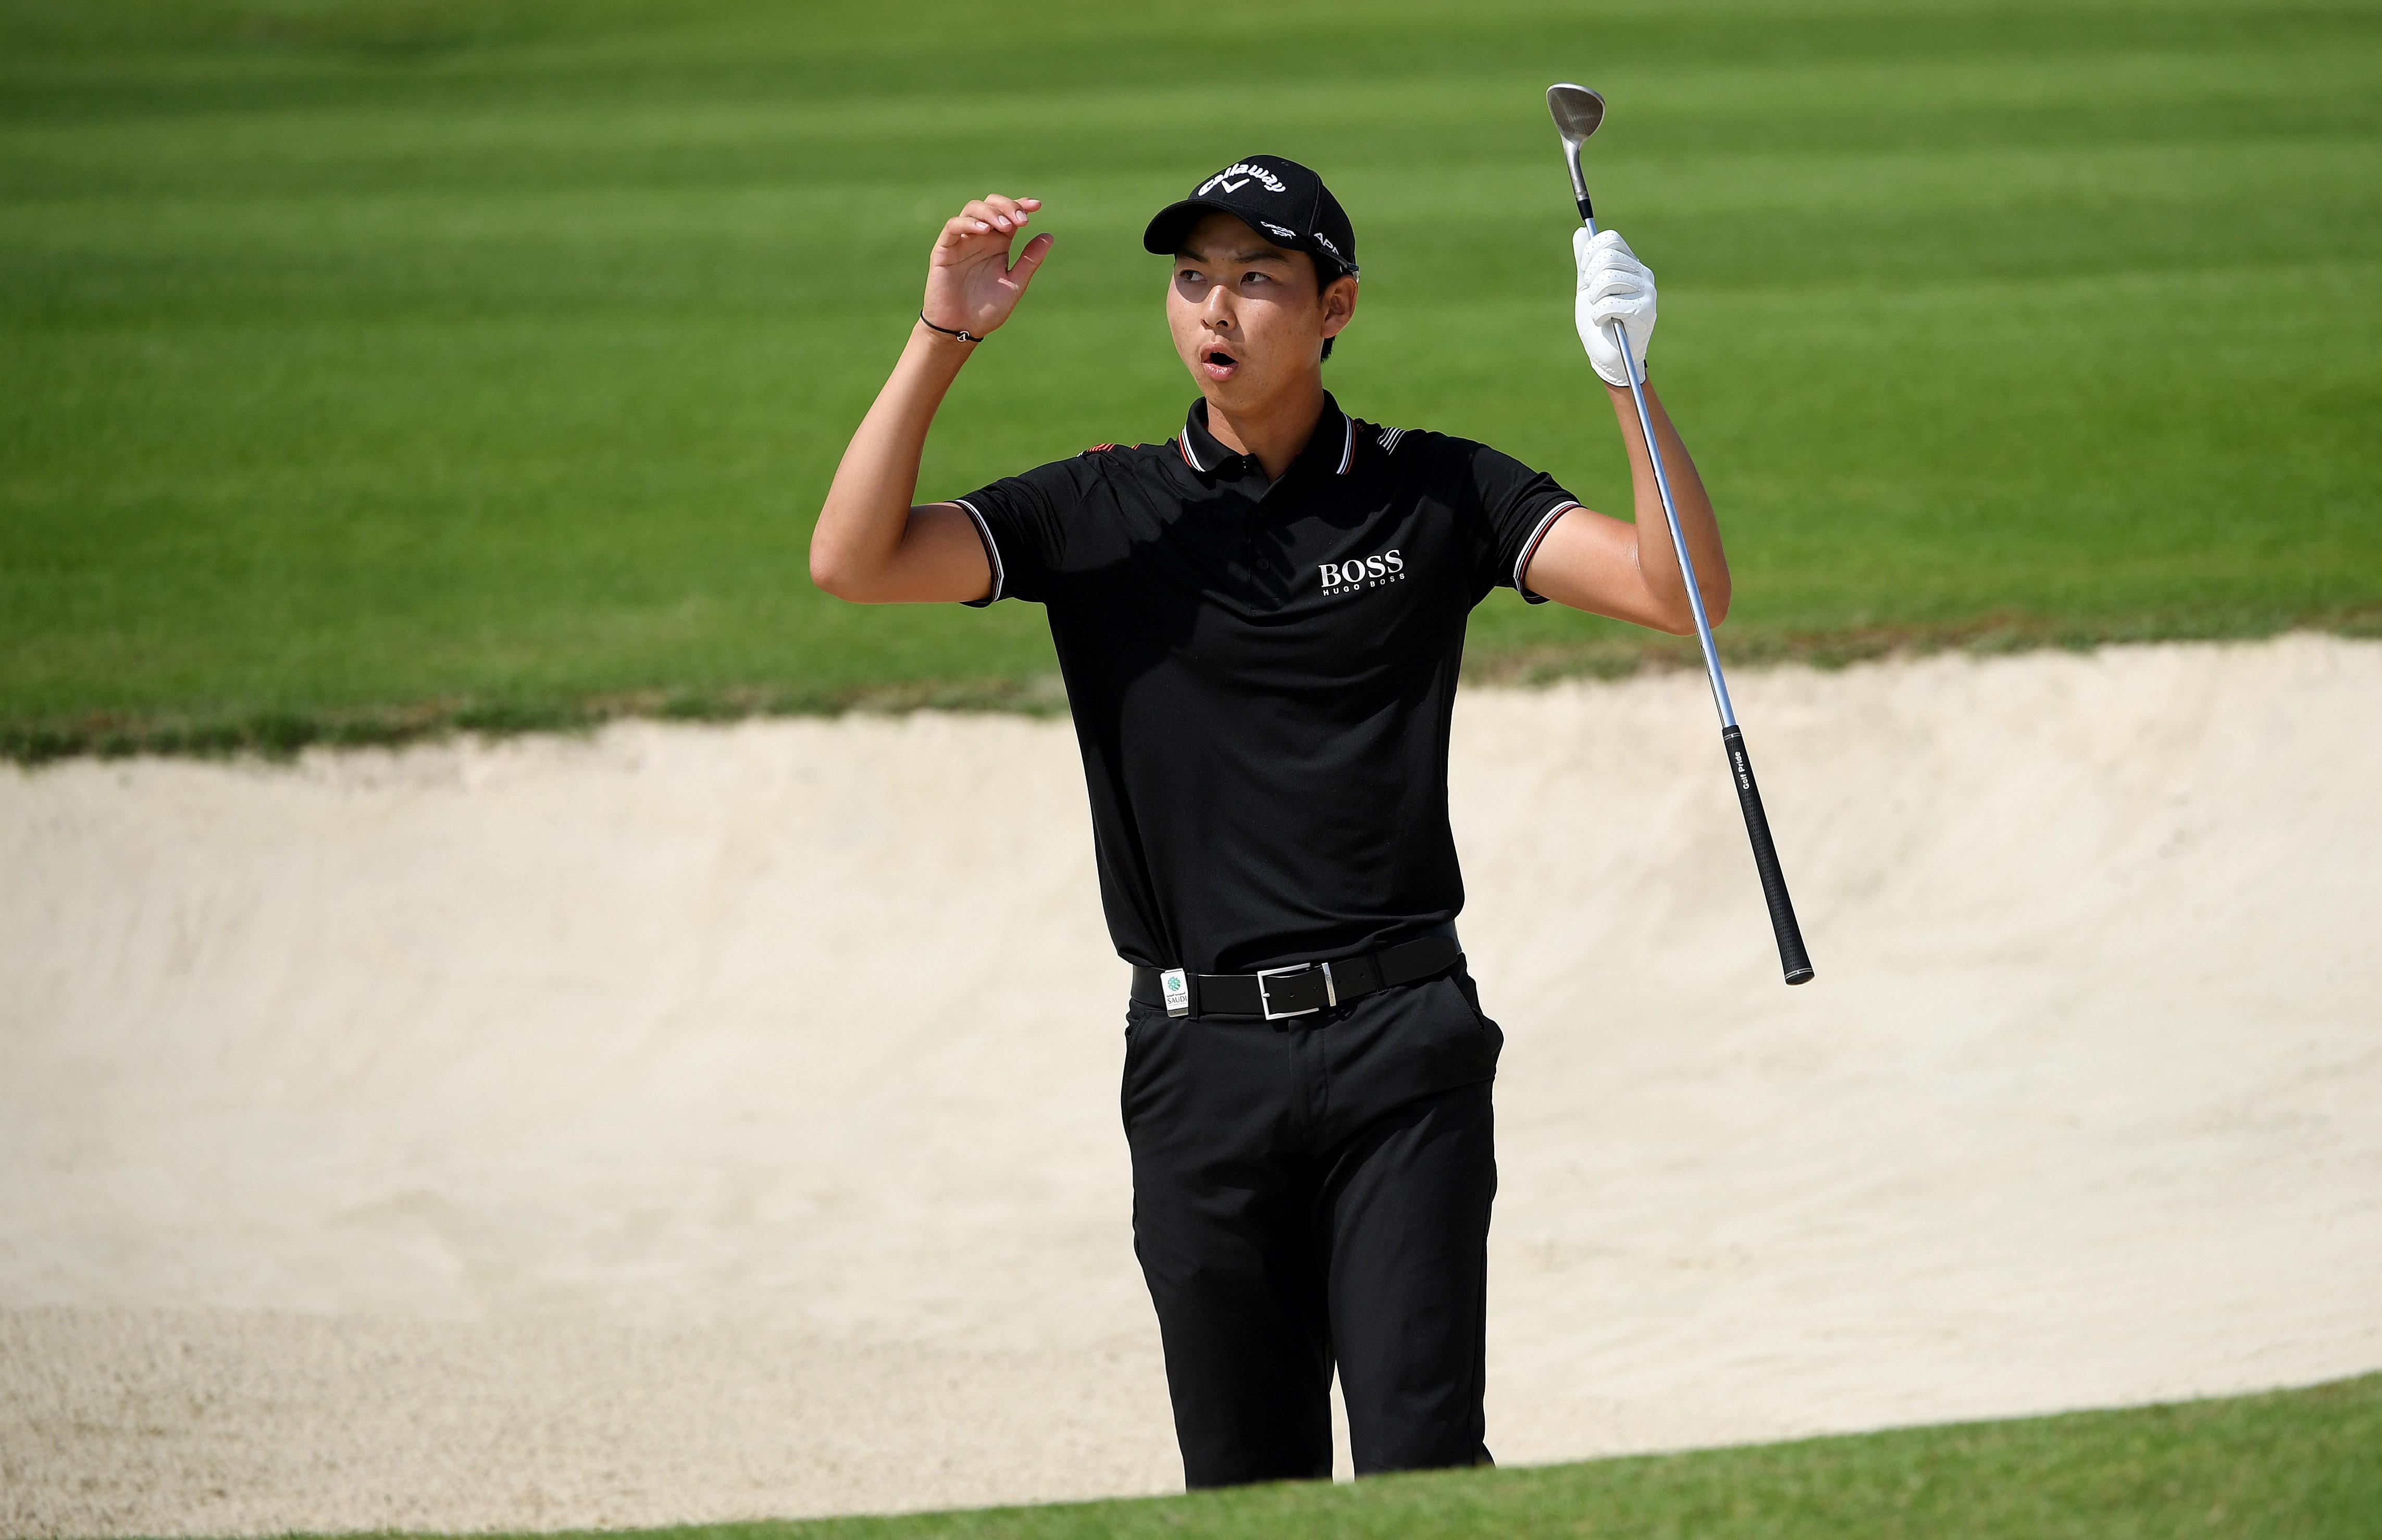 Min Woo Lee